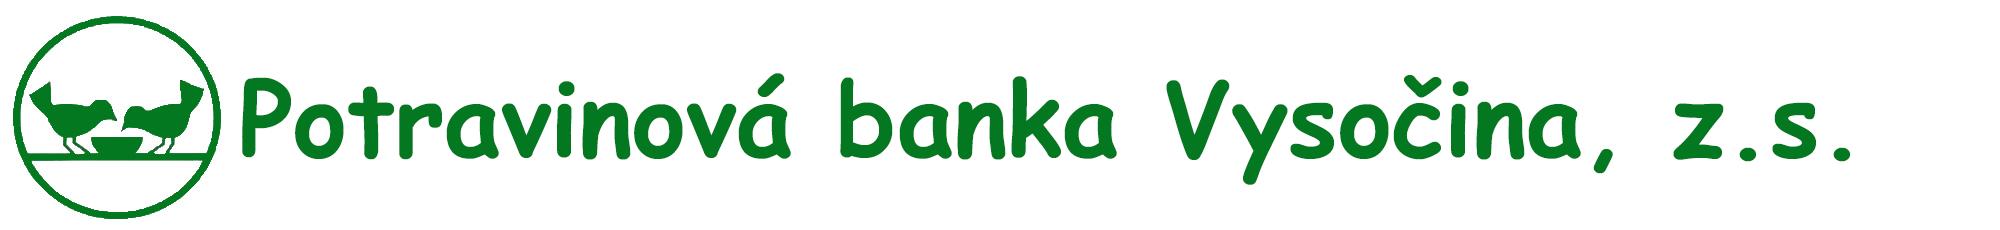 Potravinová banka Vysočina, z.s.